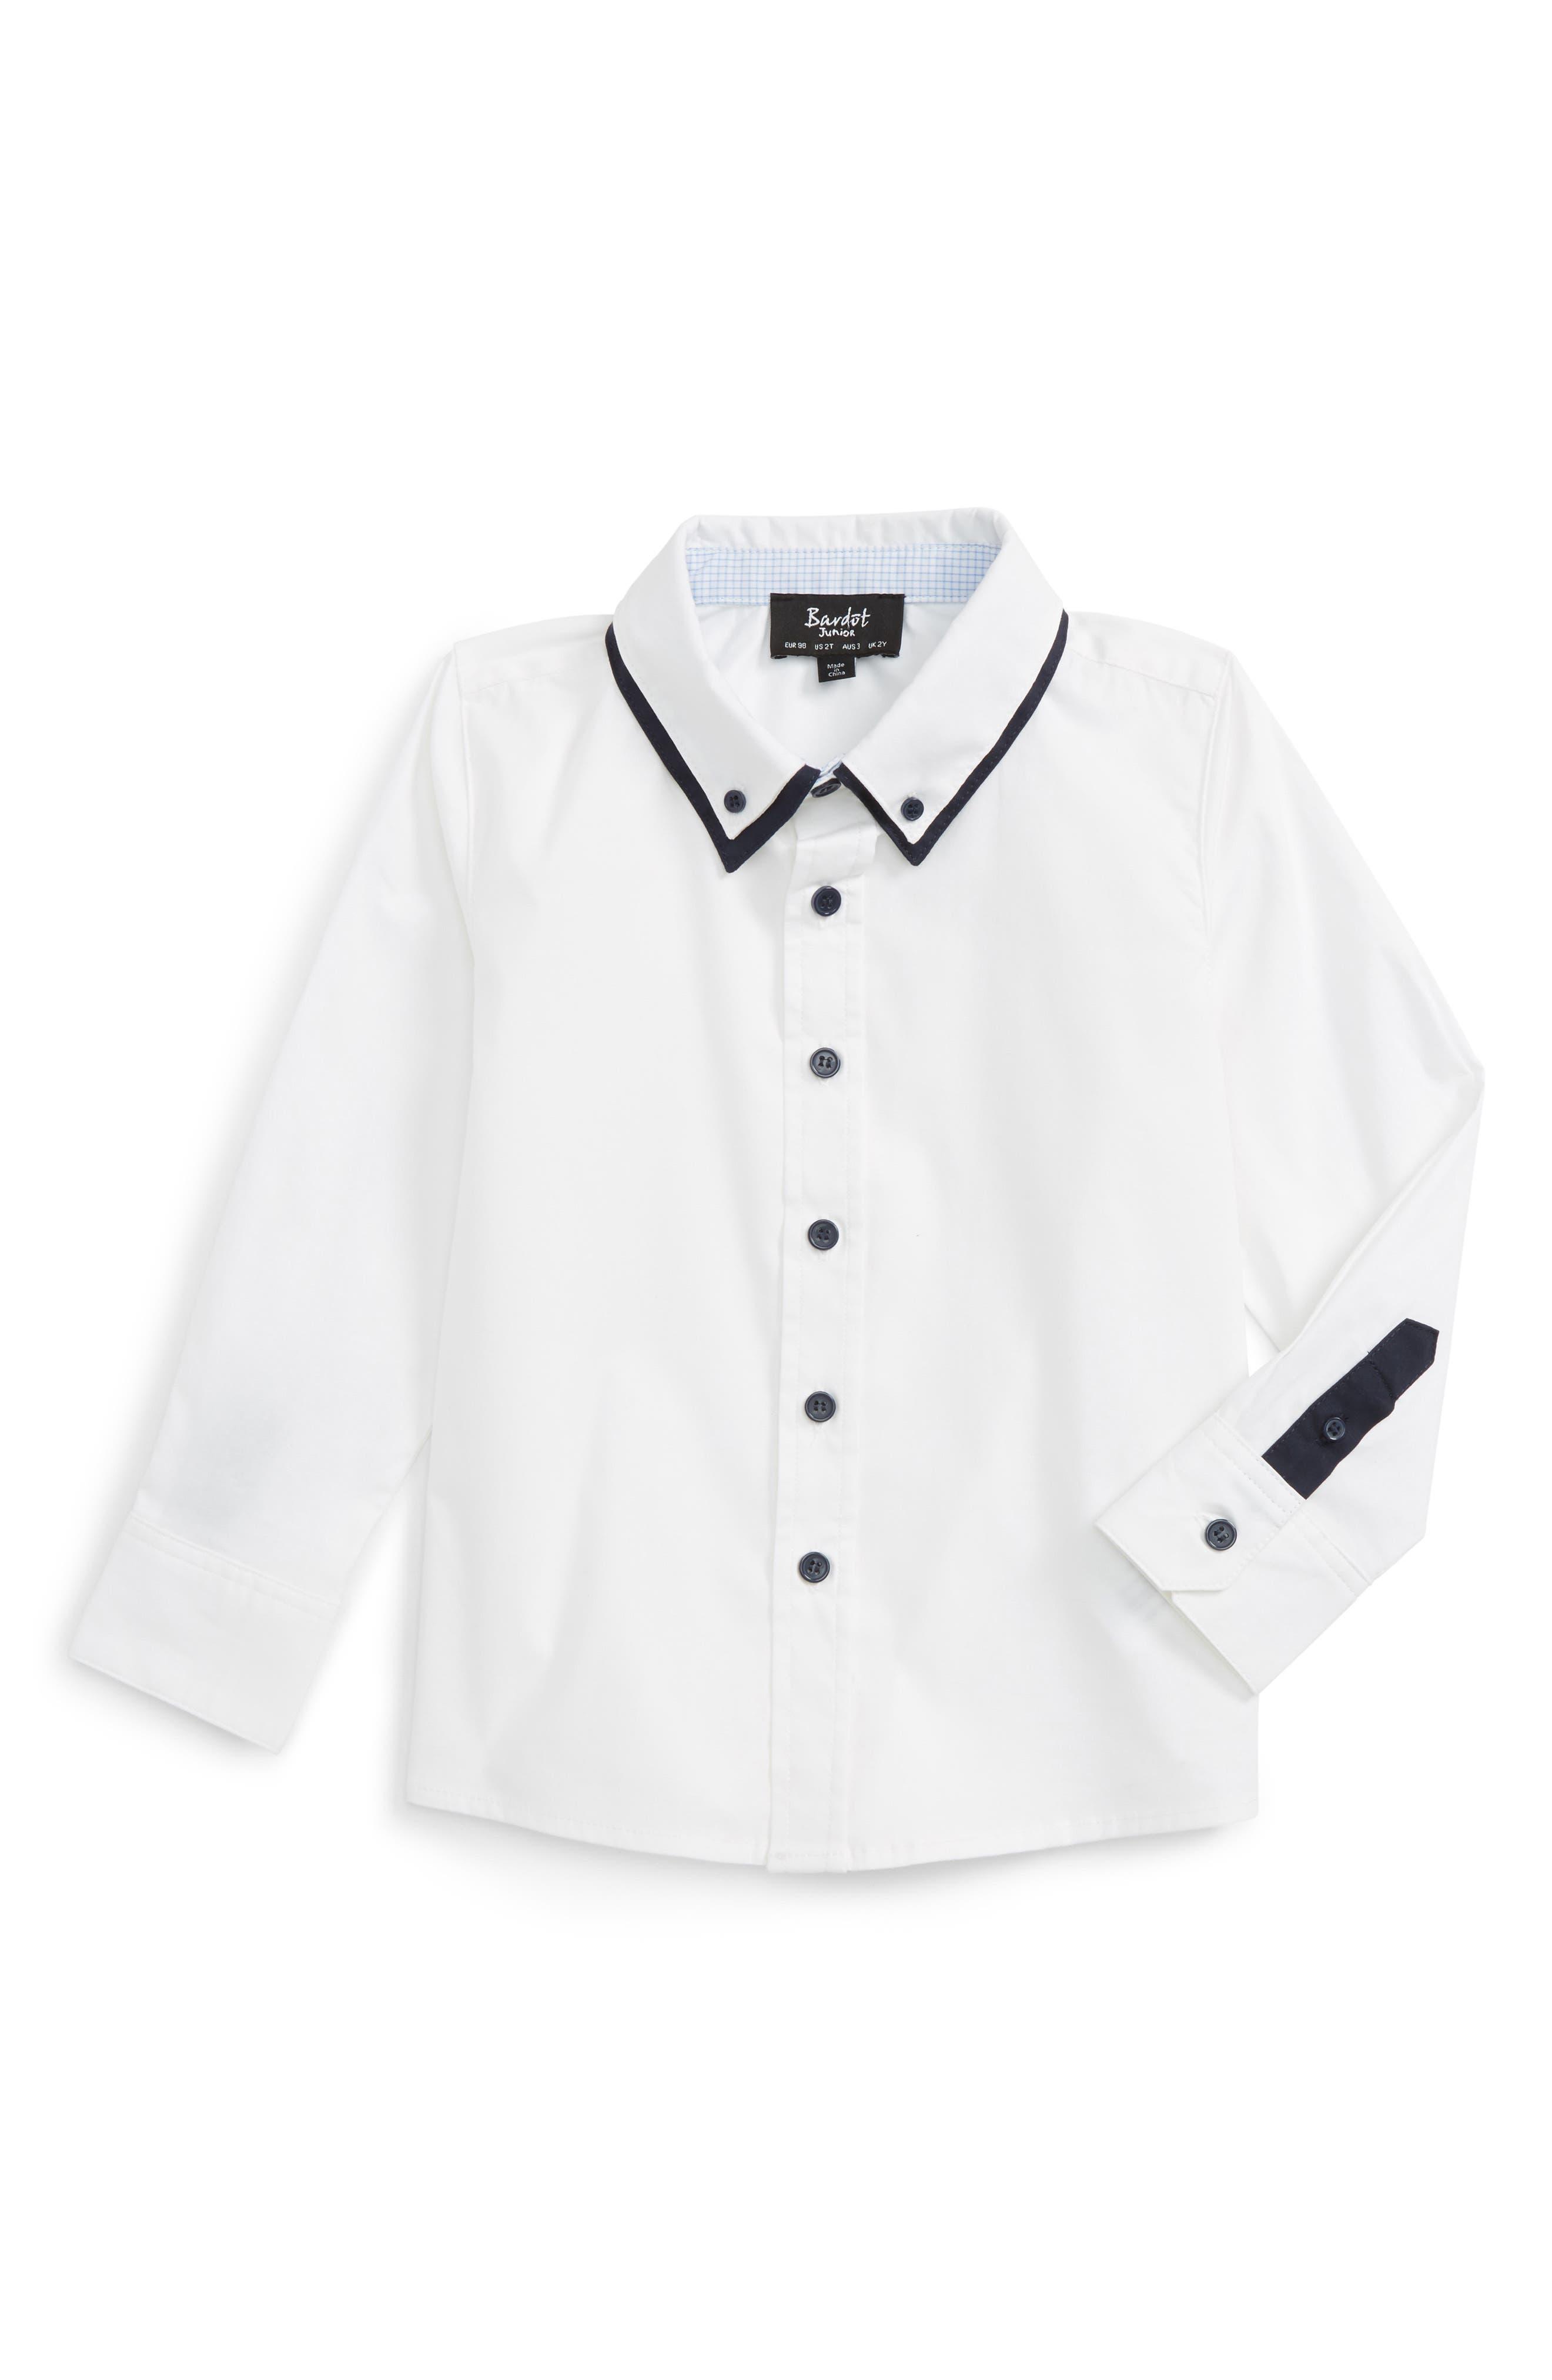 Atlantic Contrast Trim Shirt,                             Main thumbnail 1, color,                             White